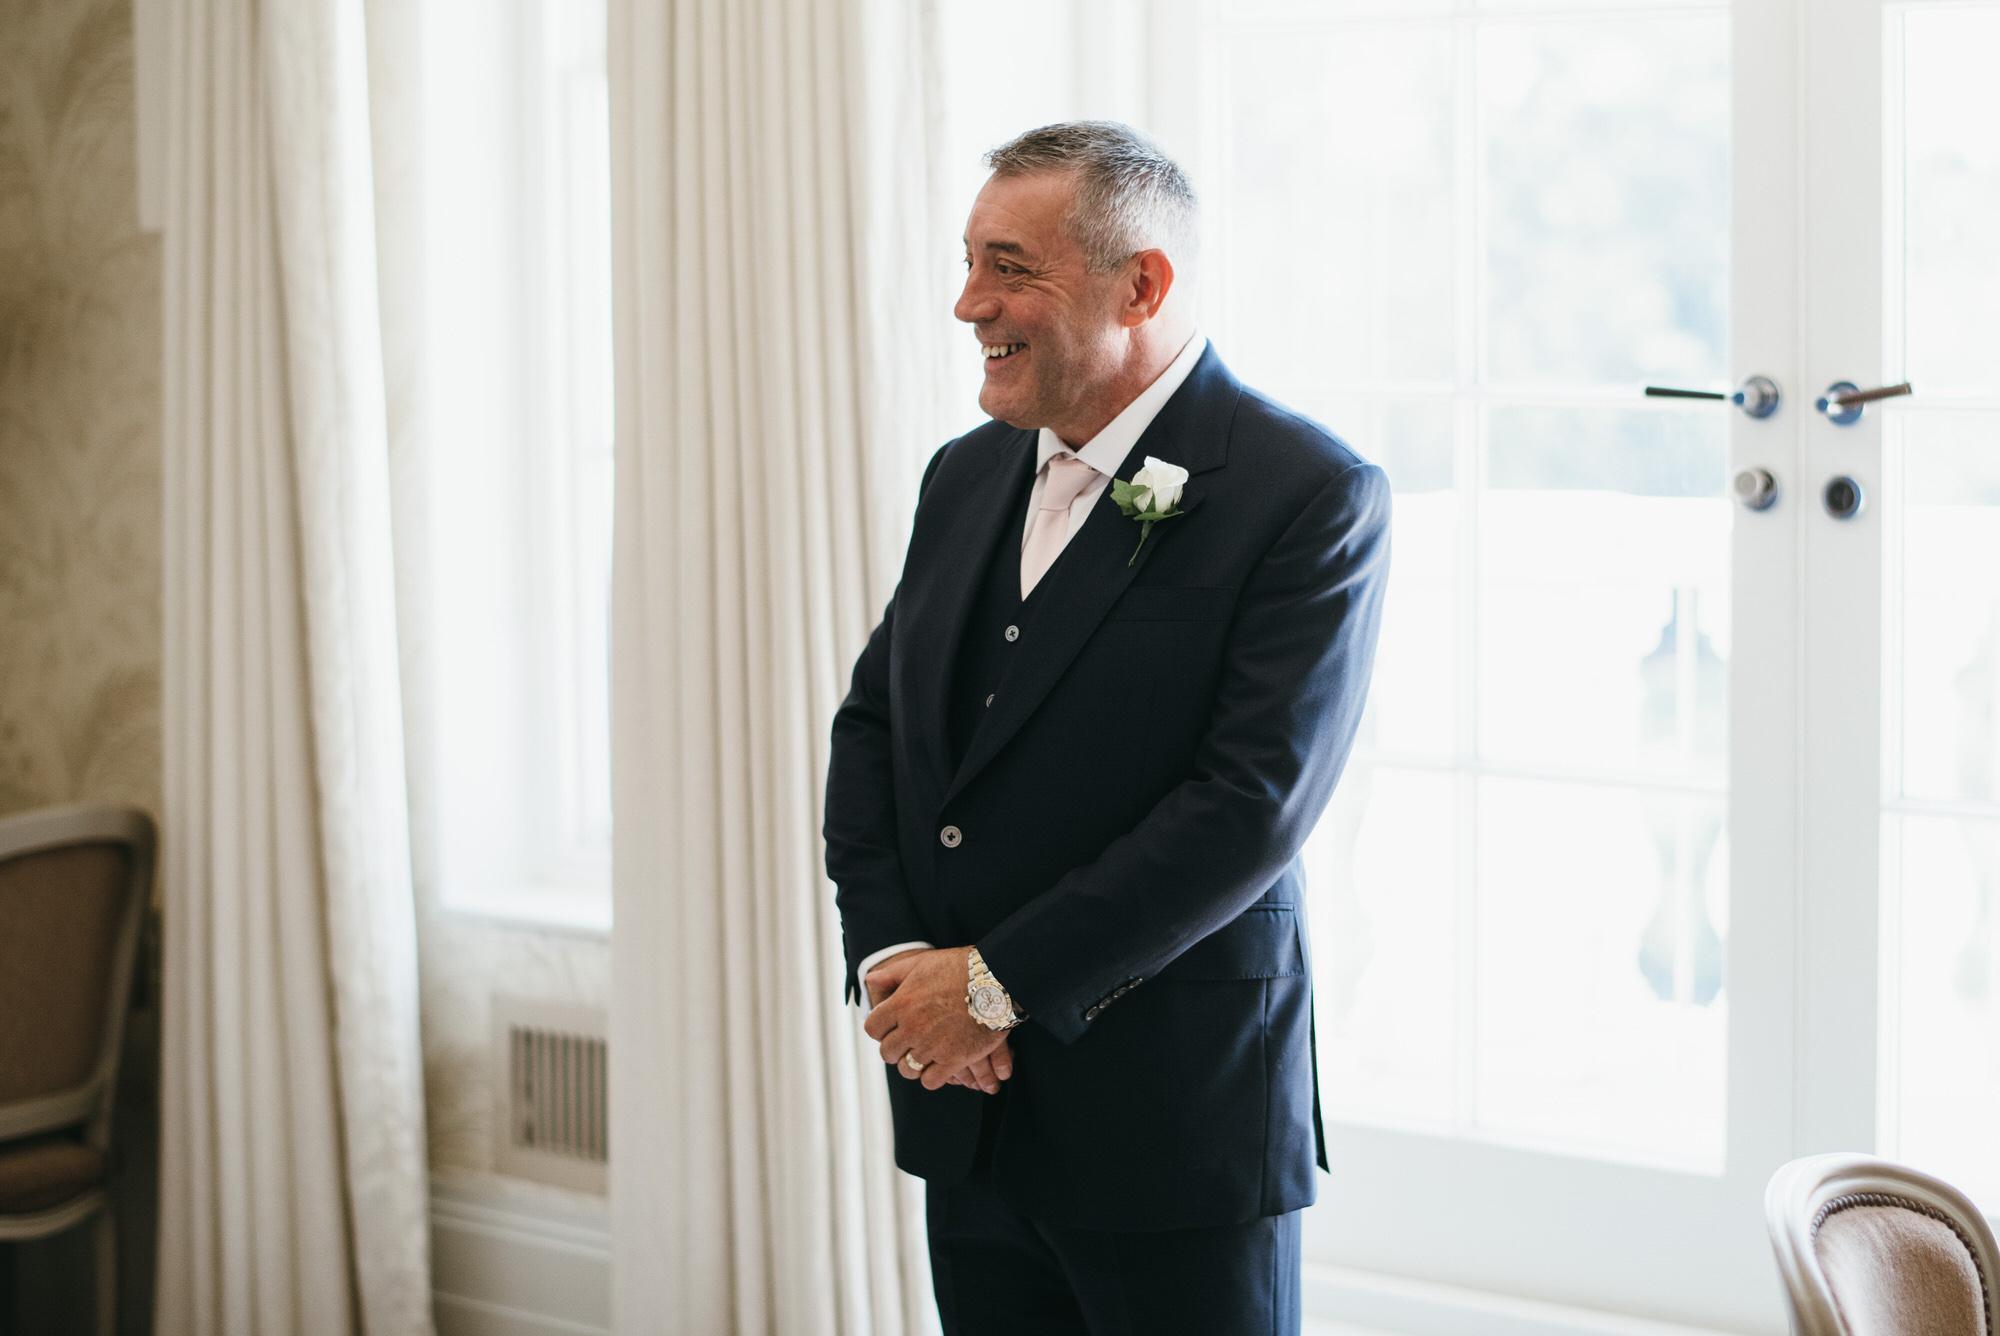 Dad sees Bride in dress Coworth Park